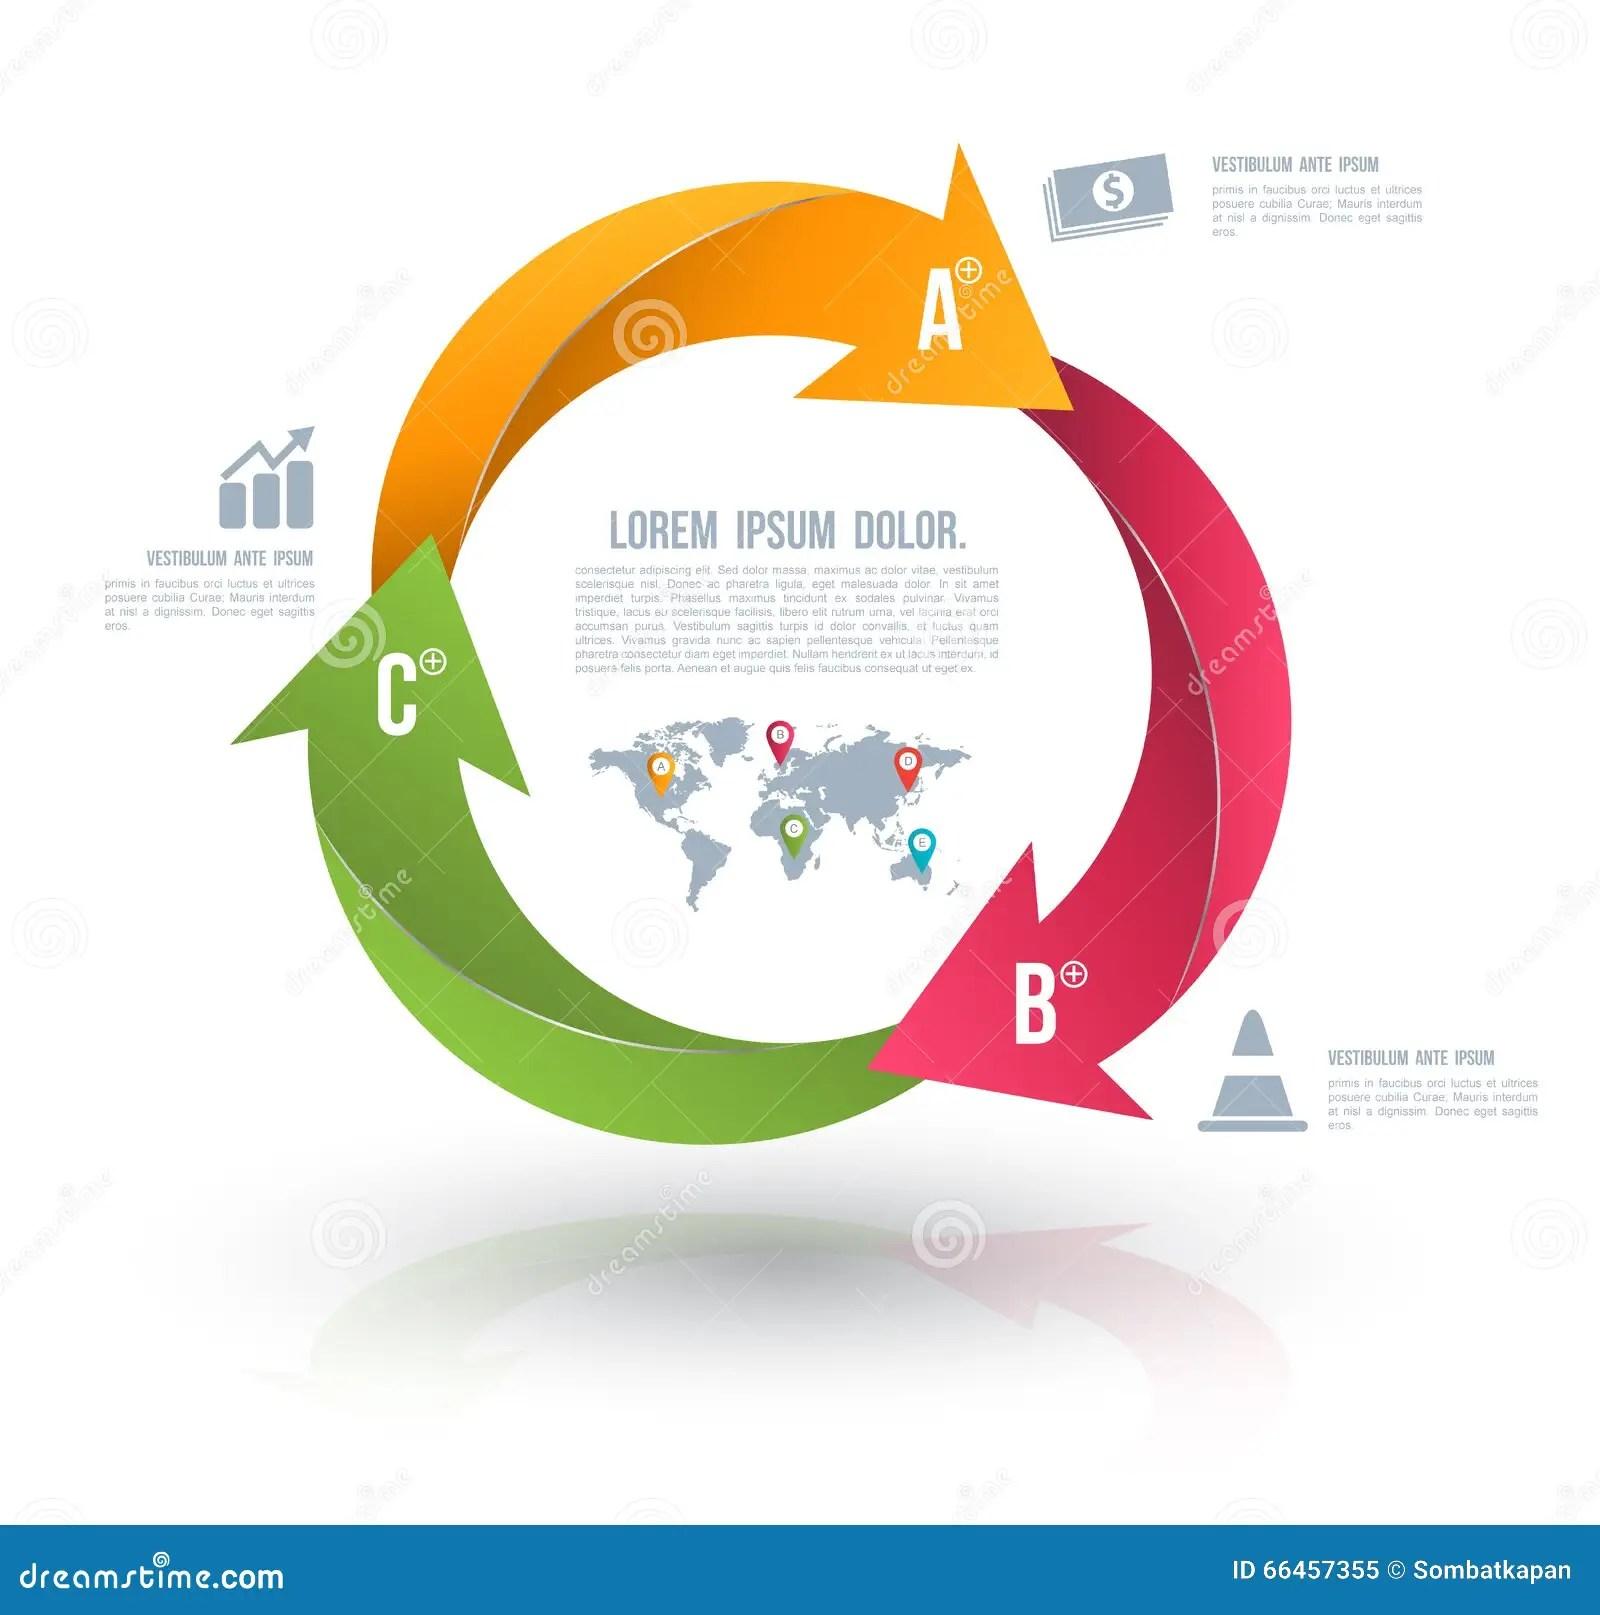 free circular arrow diagram template pupil diameter chart vector circle arrows for infographic stock